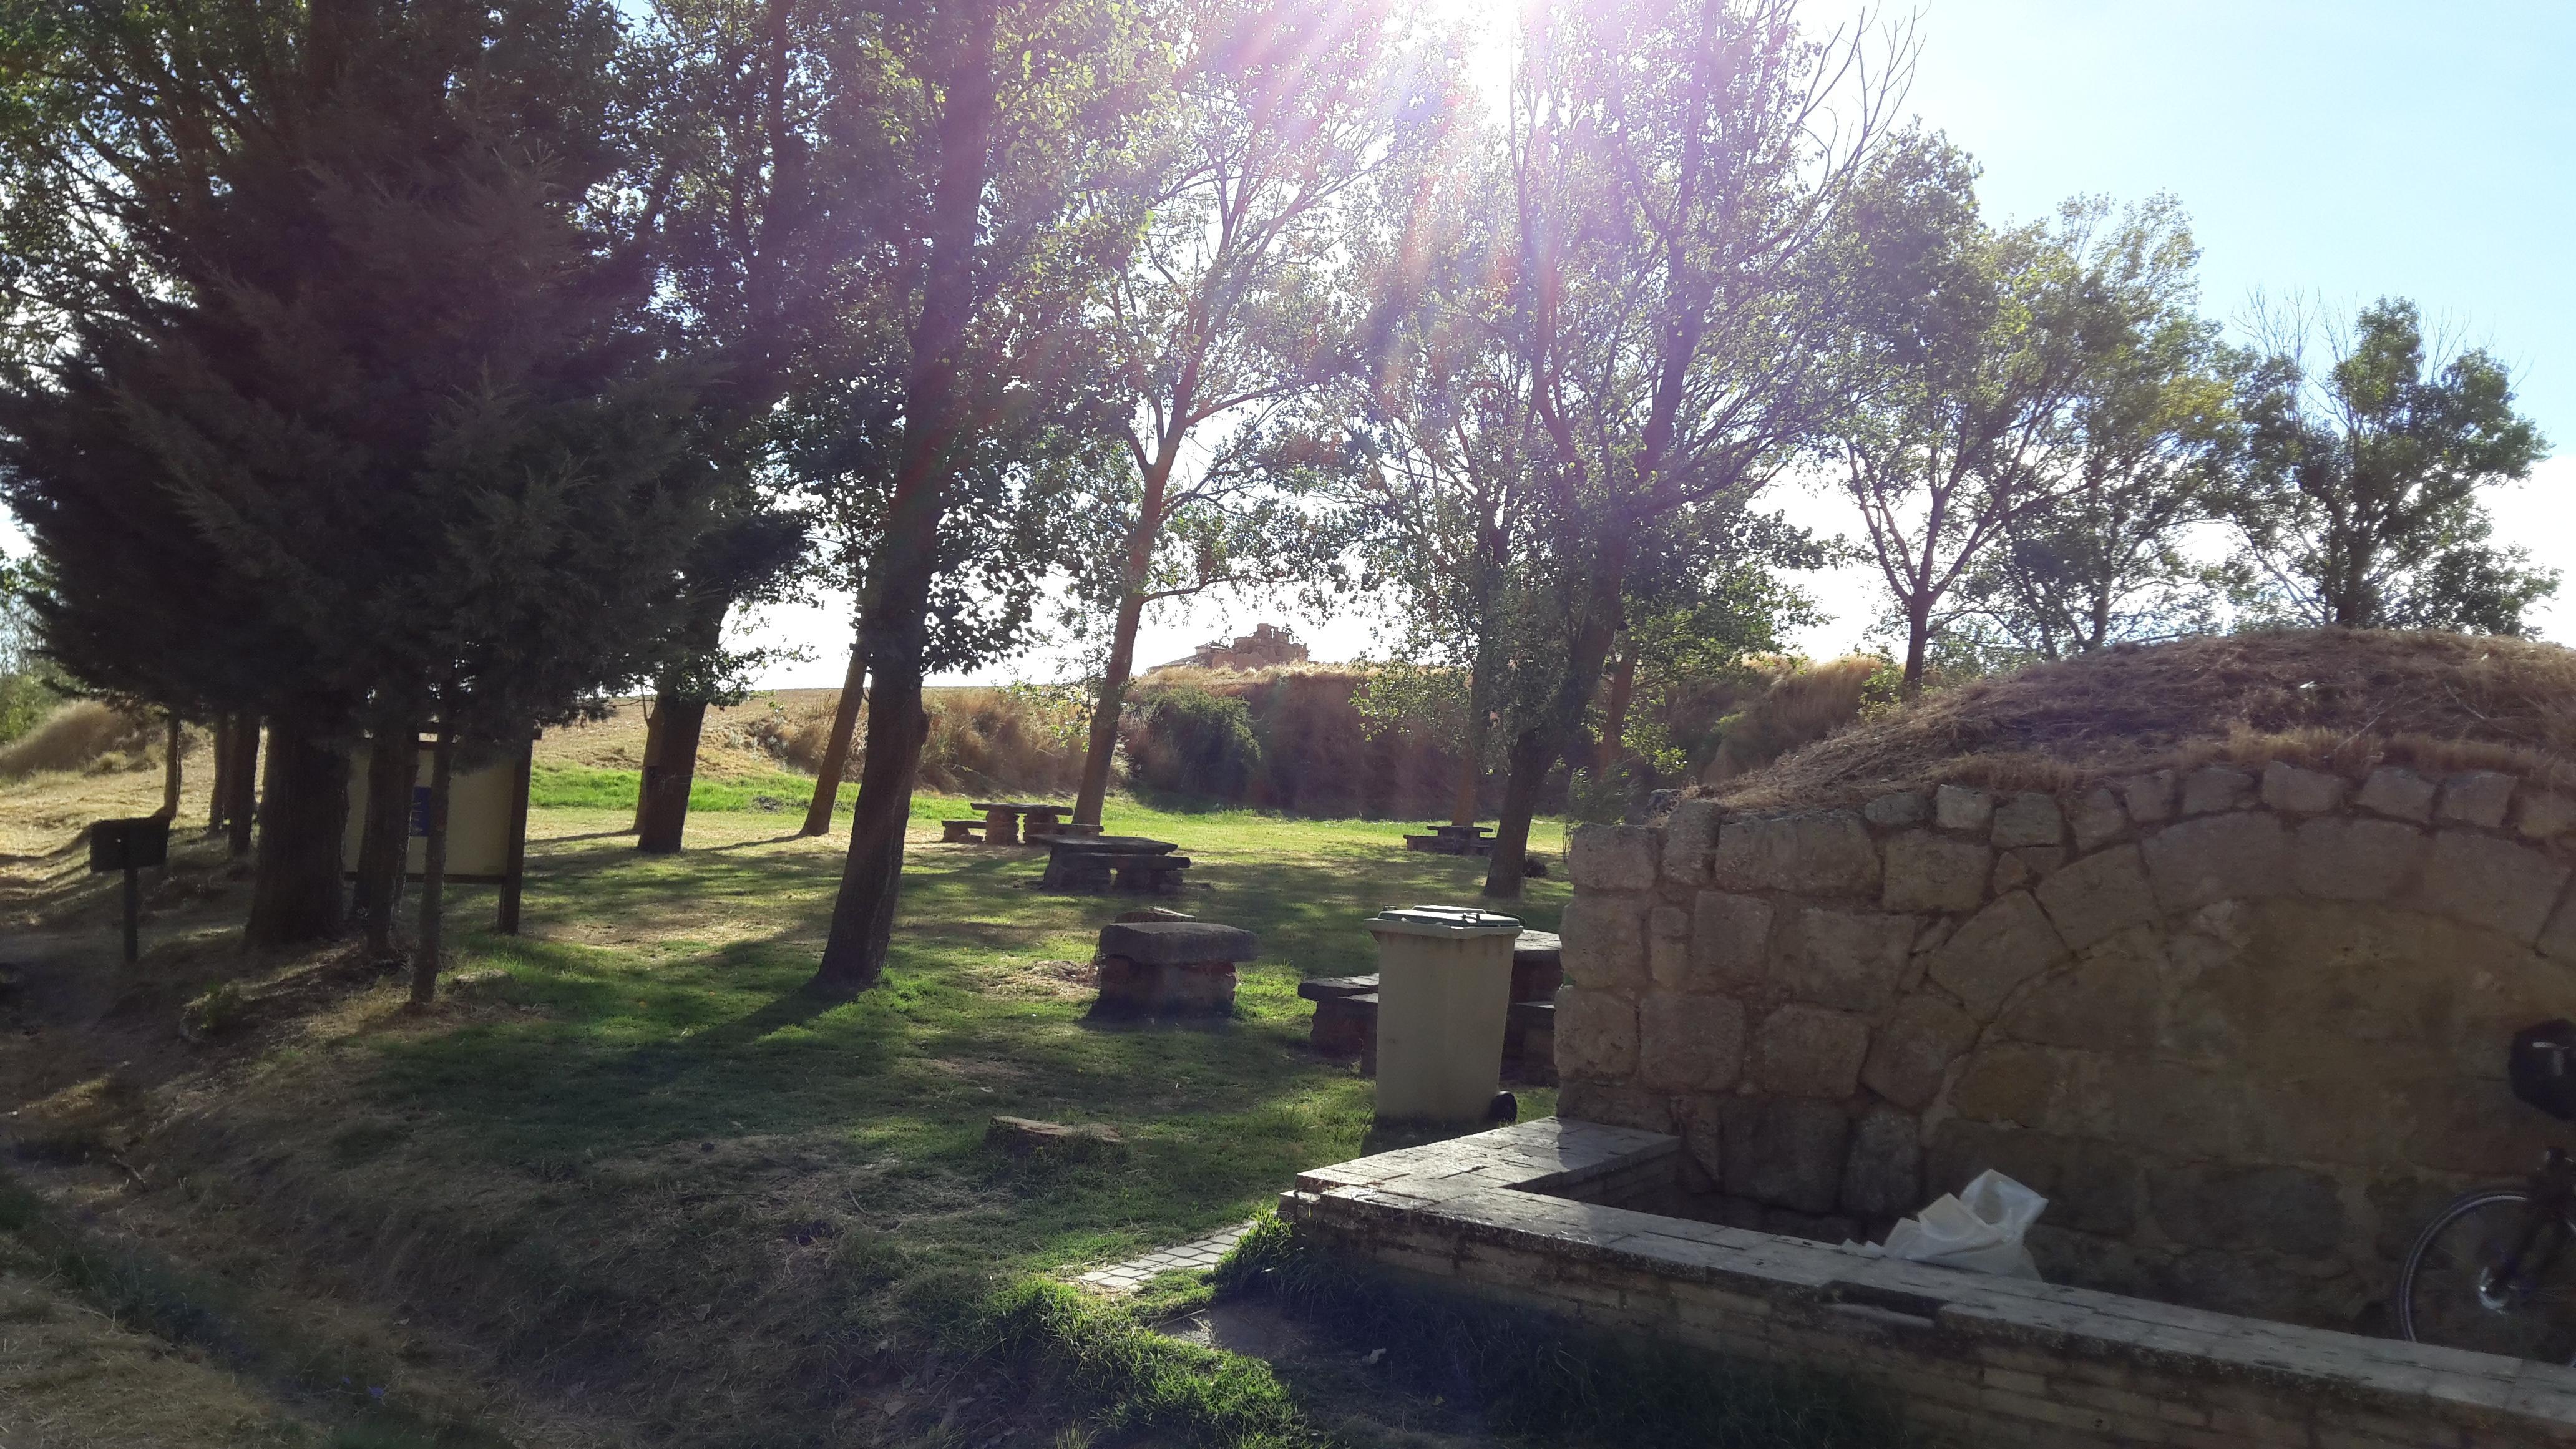 Boadilla del Camino előtt 1 km-rel